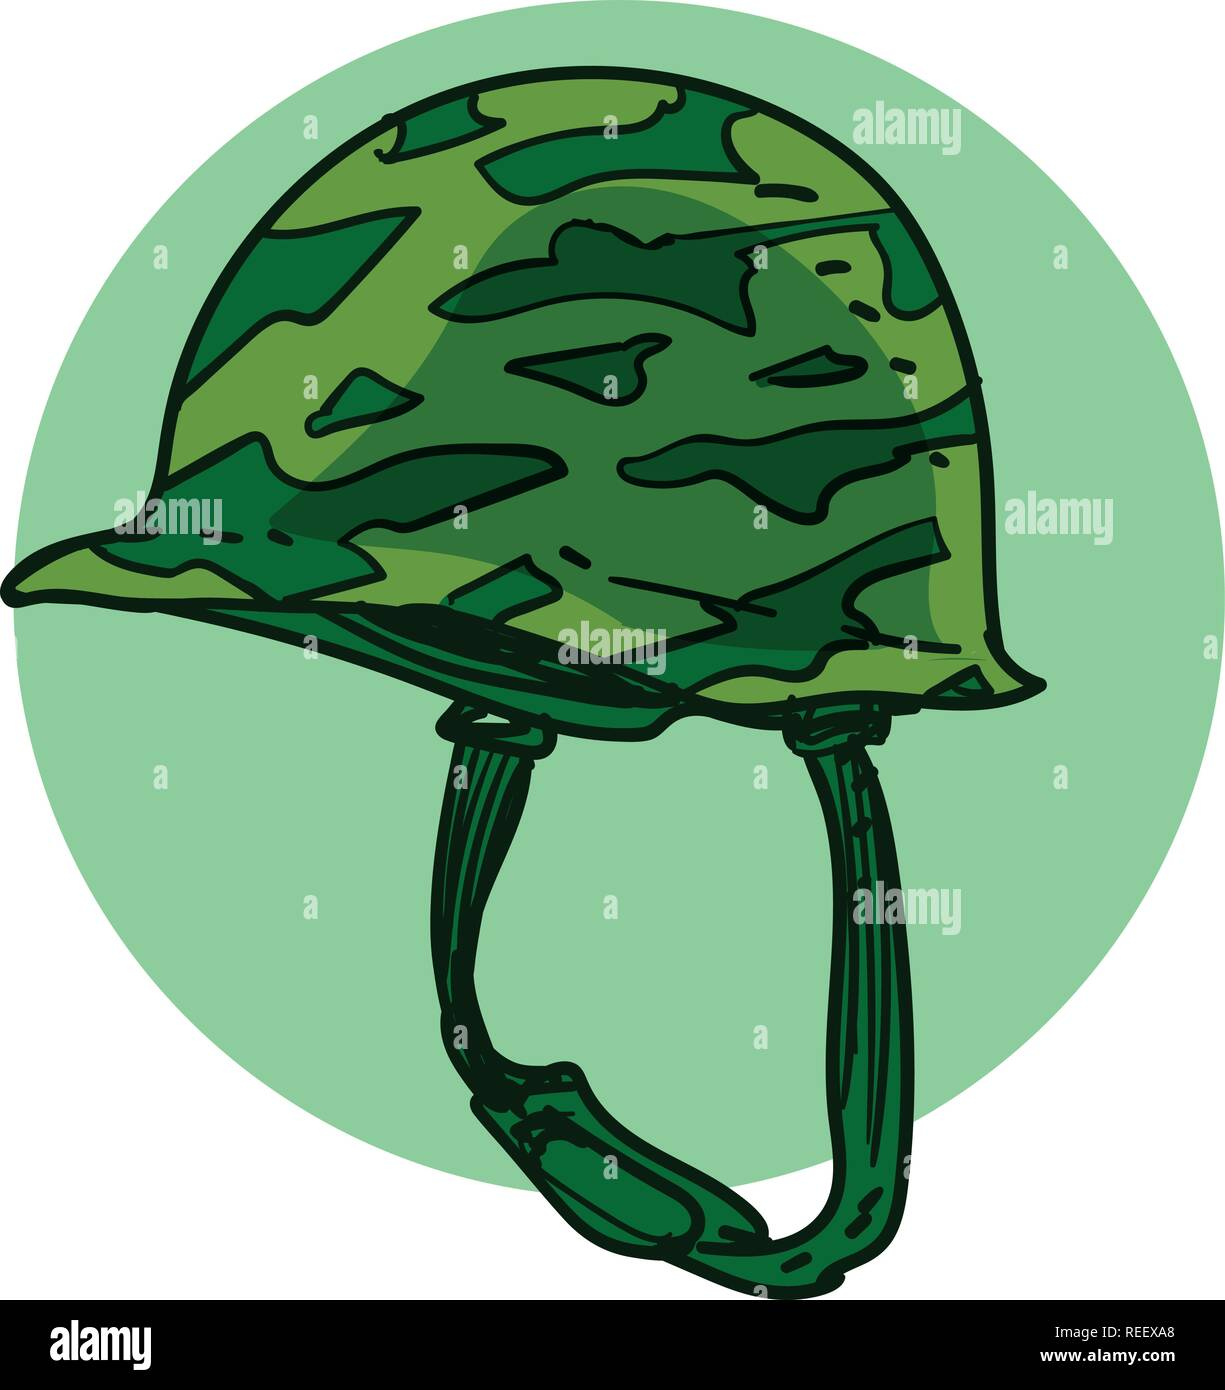 world war 2 style vintage soldier helmet, cartoon style vector illustration. - Stock Vector